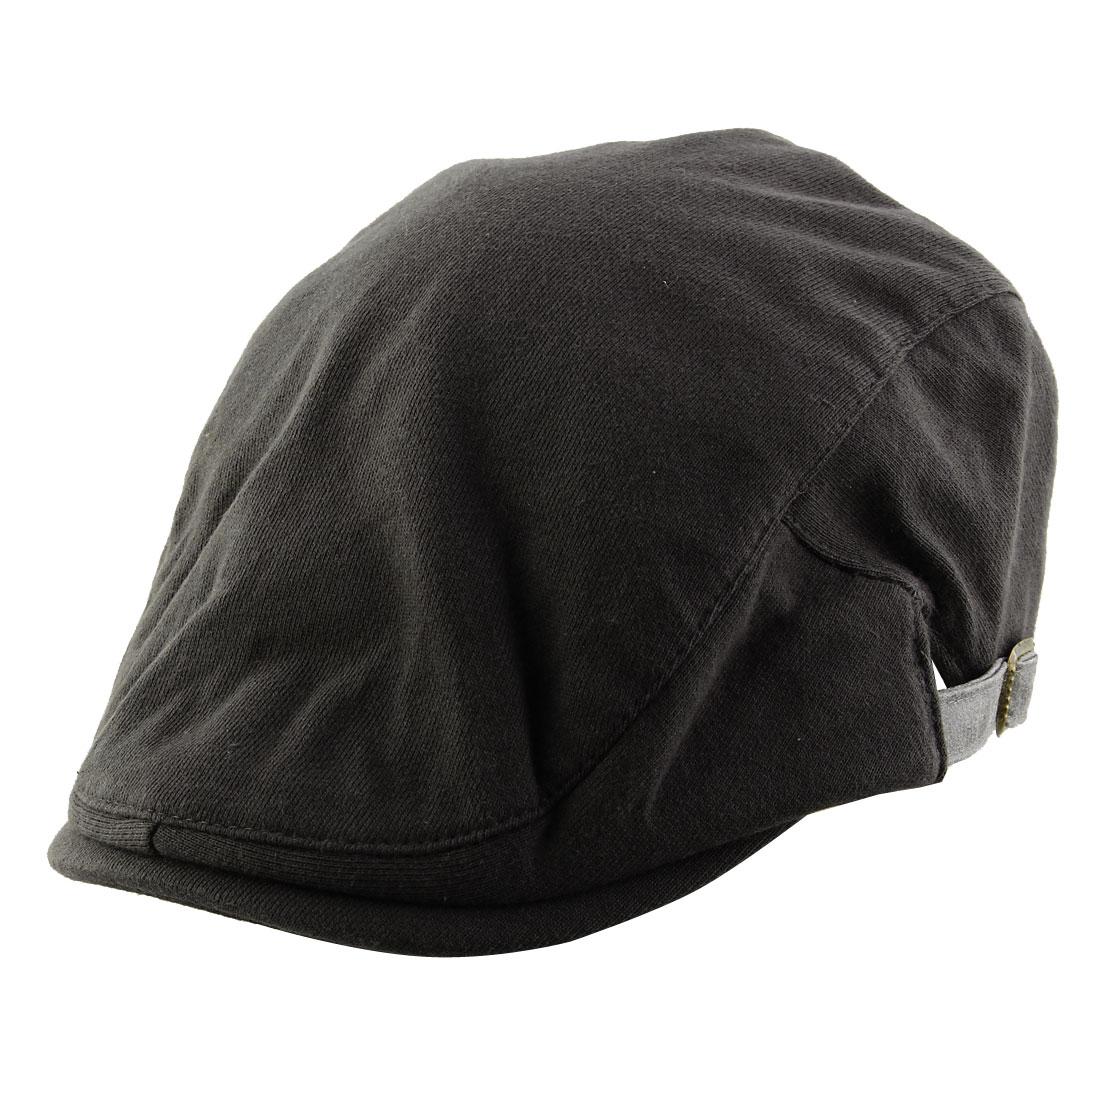 Men Women Vintage Style Newsboy Duckbill Ivy Cap Driving Beret Hat Dark Gray